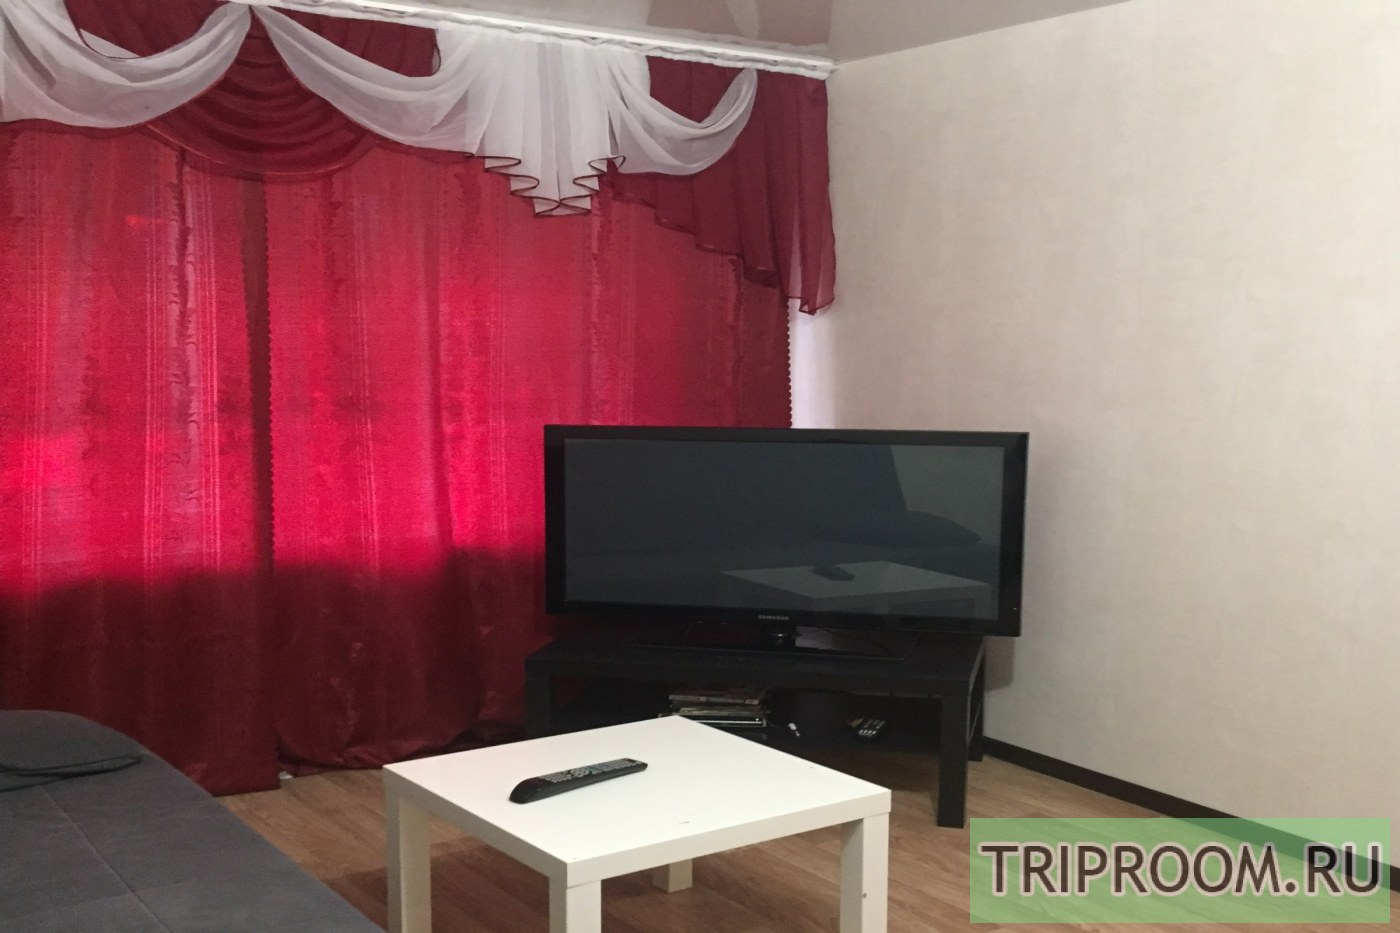 1-комнатная квартира посуточно (вариант № 2841), ул. Коротченко улица, фото № 12